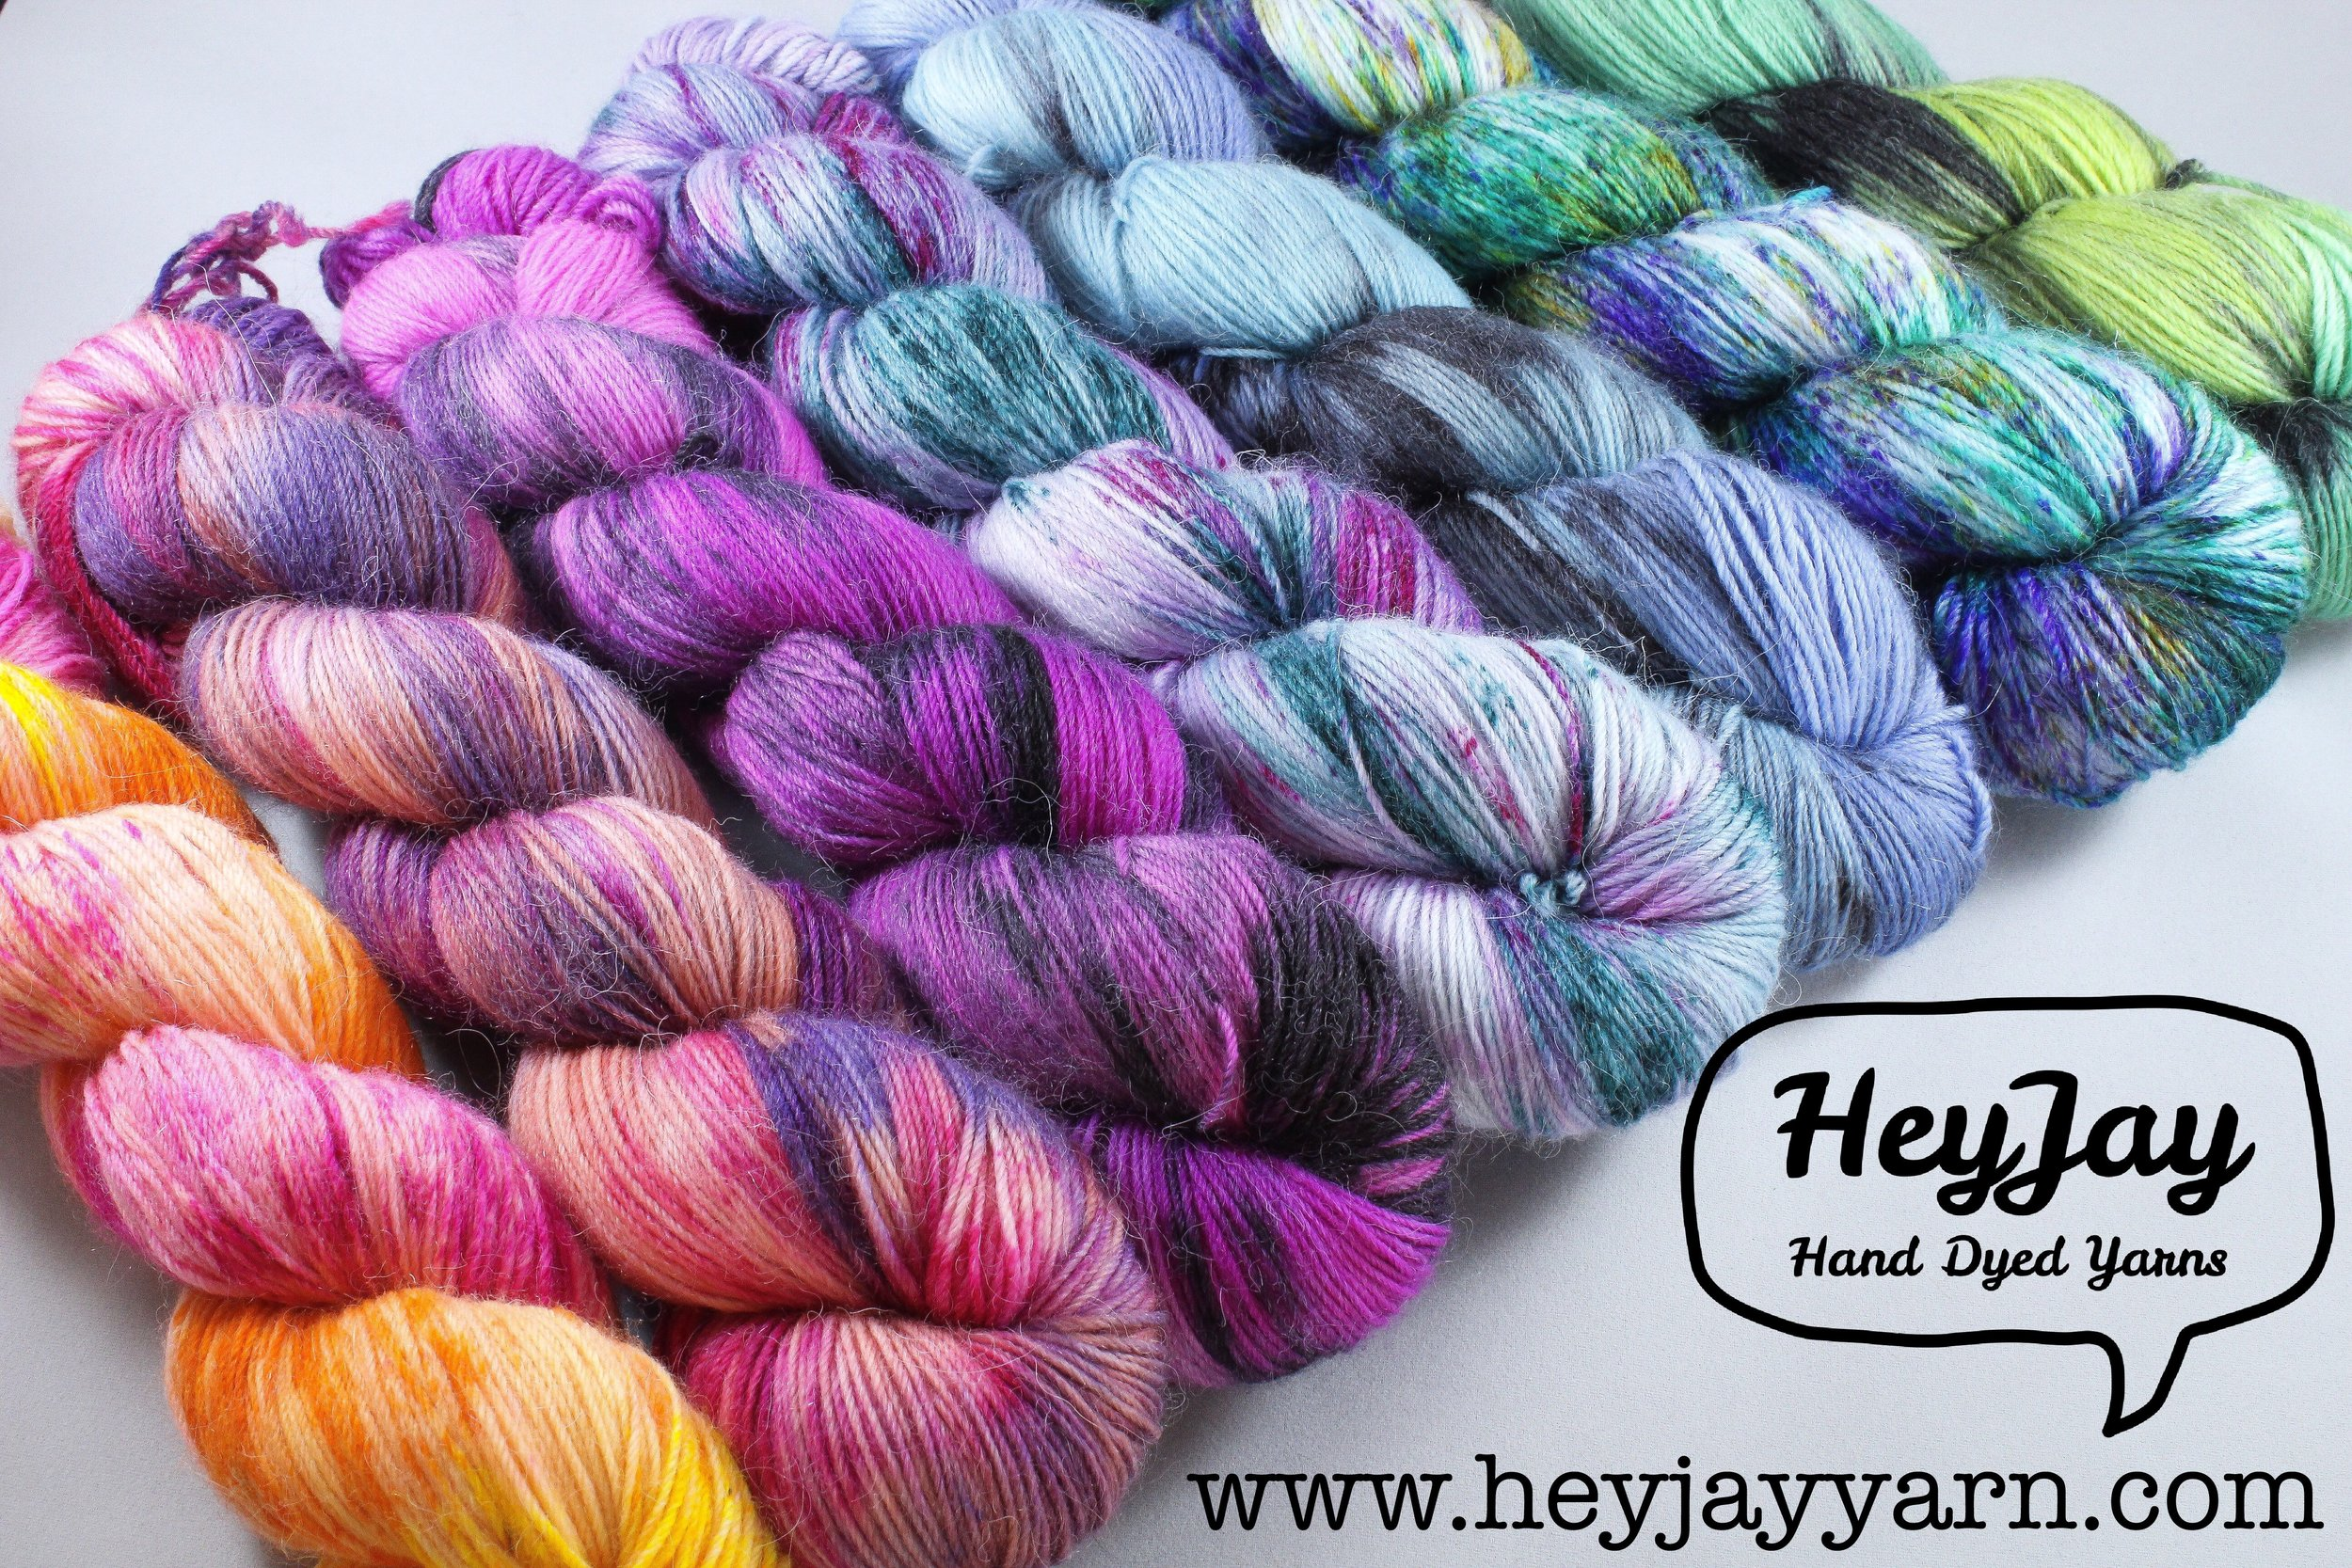 hayjay-yarn.JPG